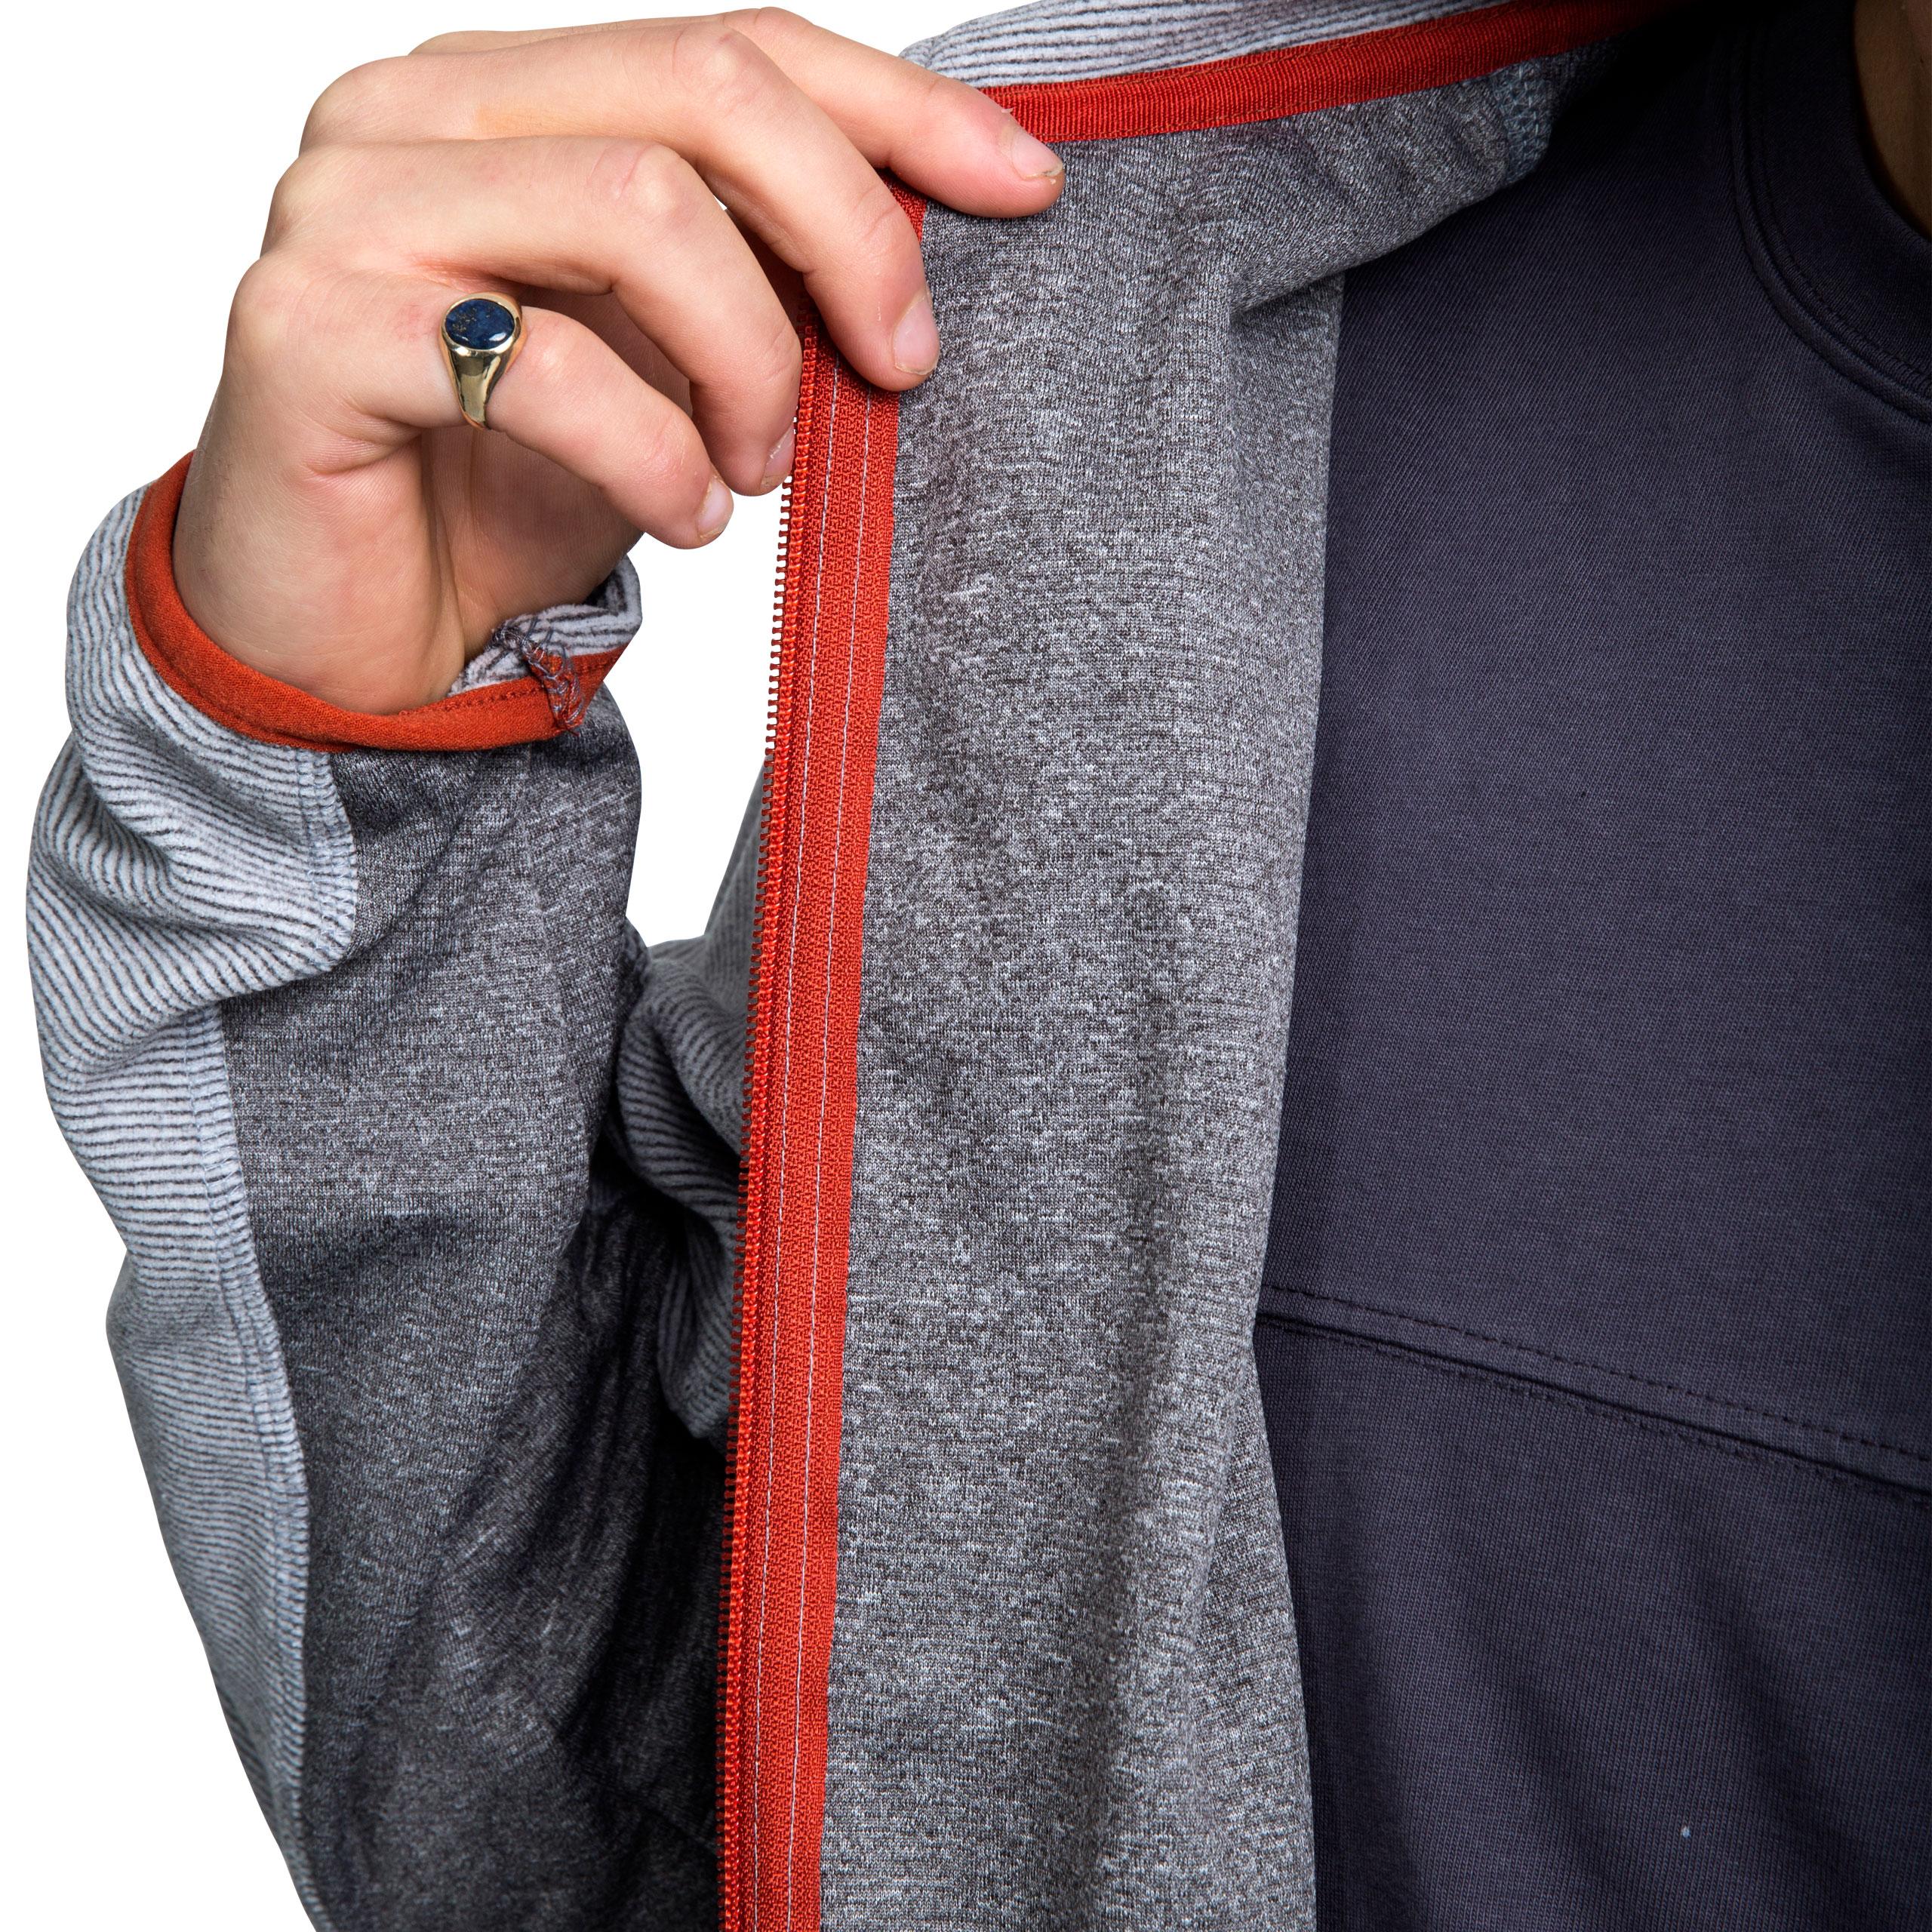 Trespass-Mirth-Mens-Textured-Fleece-Jacket-Full-Front-Hiking-Jumper-with-Pockets thumbnail 14